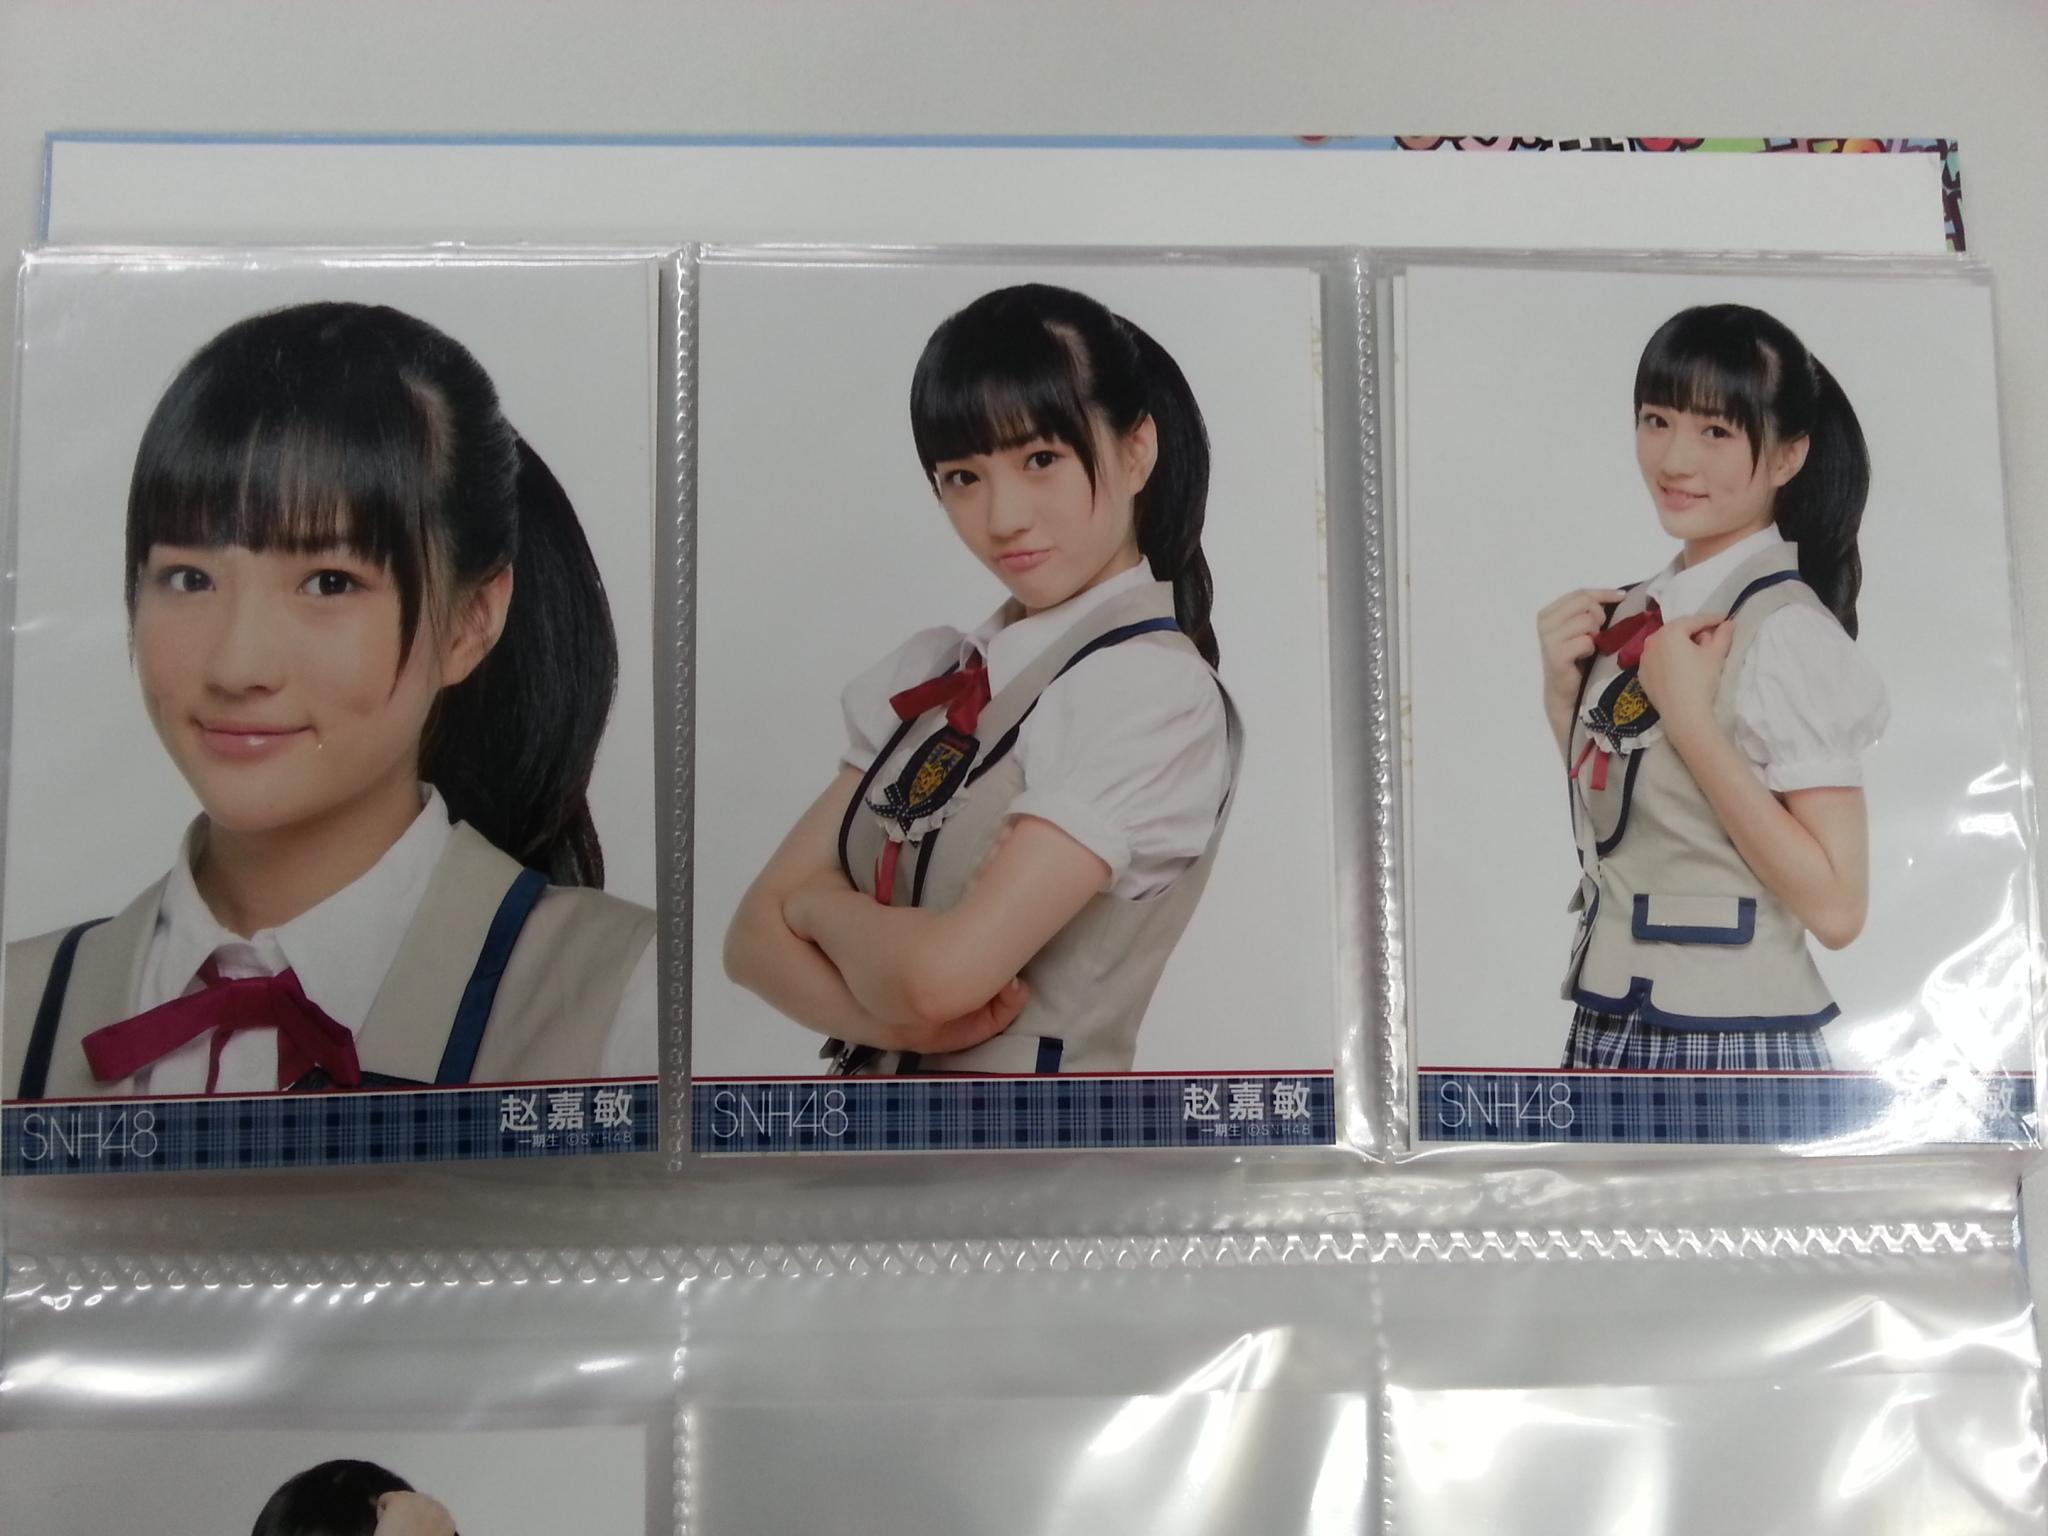 【SNH48】上海からの贈り物ヽ(*´∀`)ノ趙嘉敏(SAVOKI)の写真とバッジ&林思意(シャオスー)のバッジ